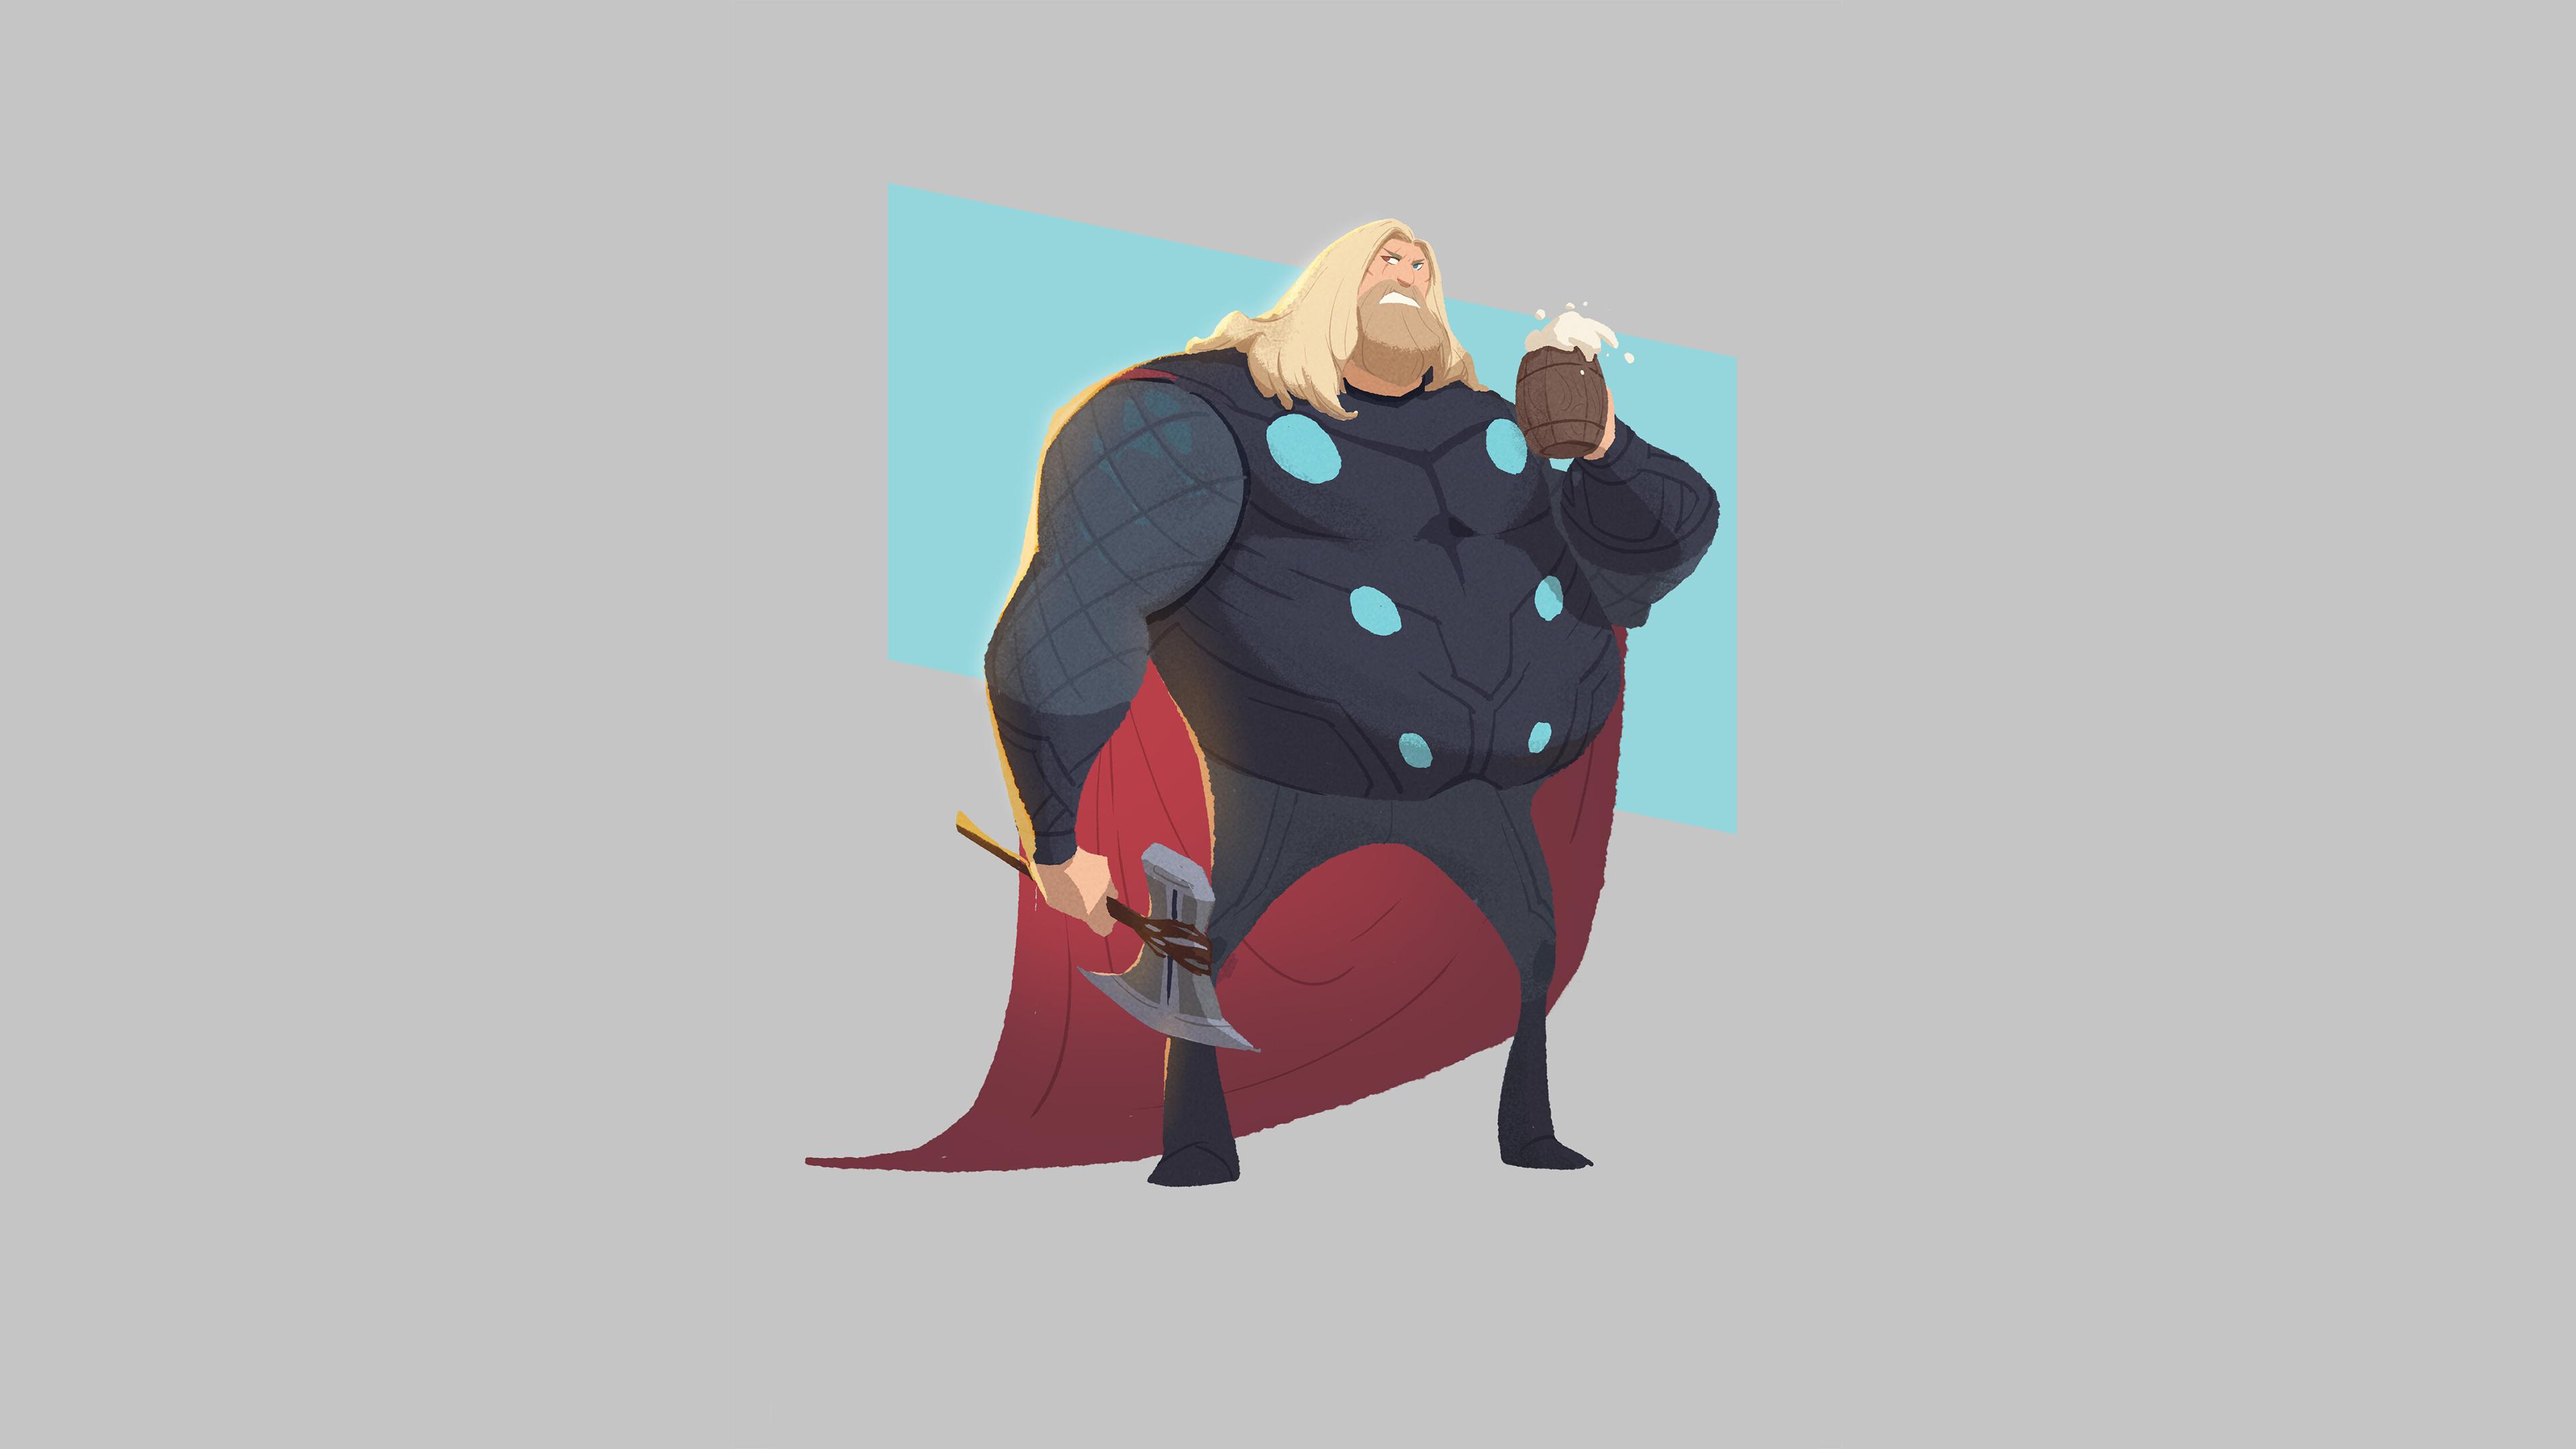 fat thor minimal 1580585422 - Fat Thor Minimal - Fat Thor Minimal wallpapers, Fat Thor minimal phone wallpapers 4k, Fat Thor Minimal 4k wallpapers